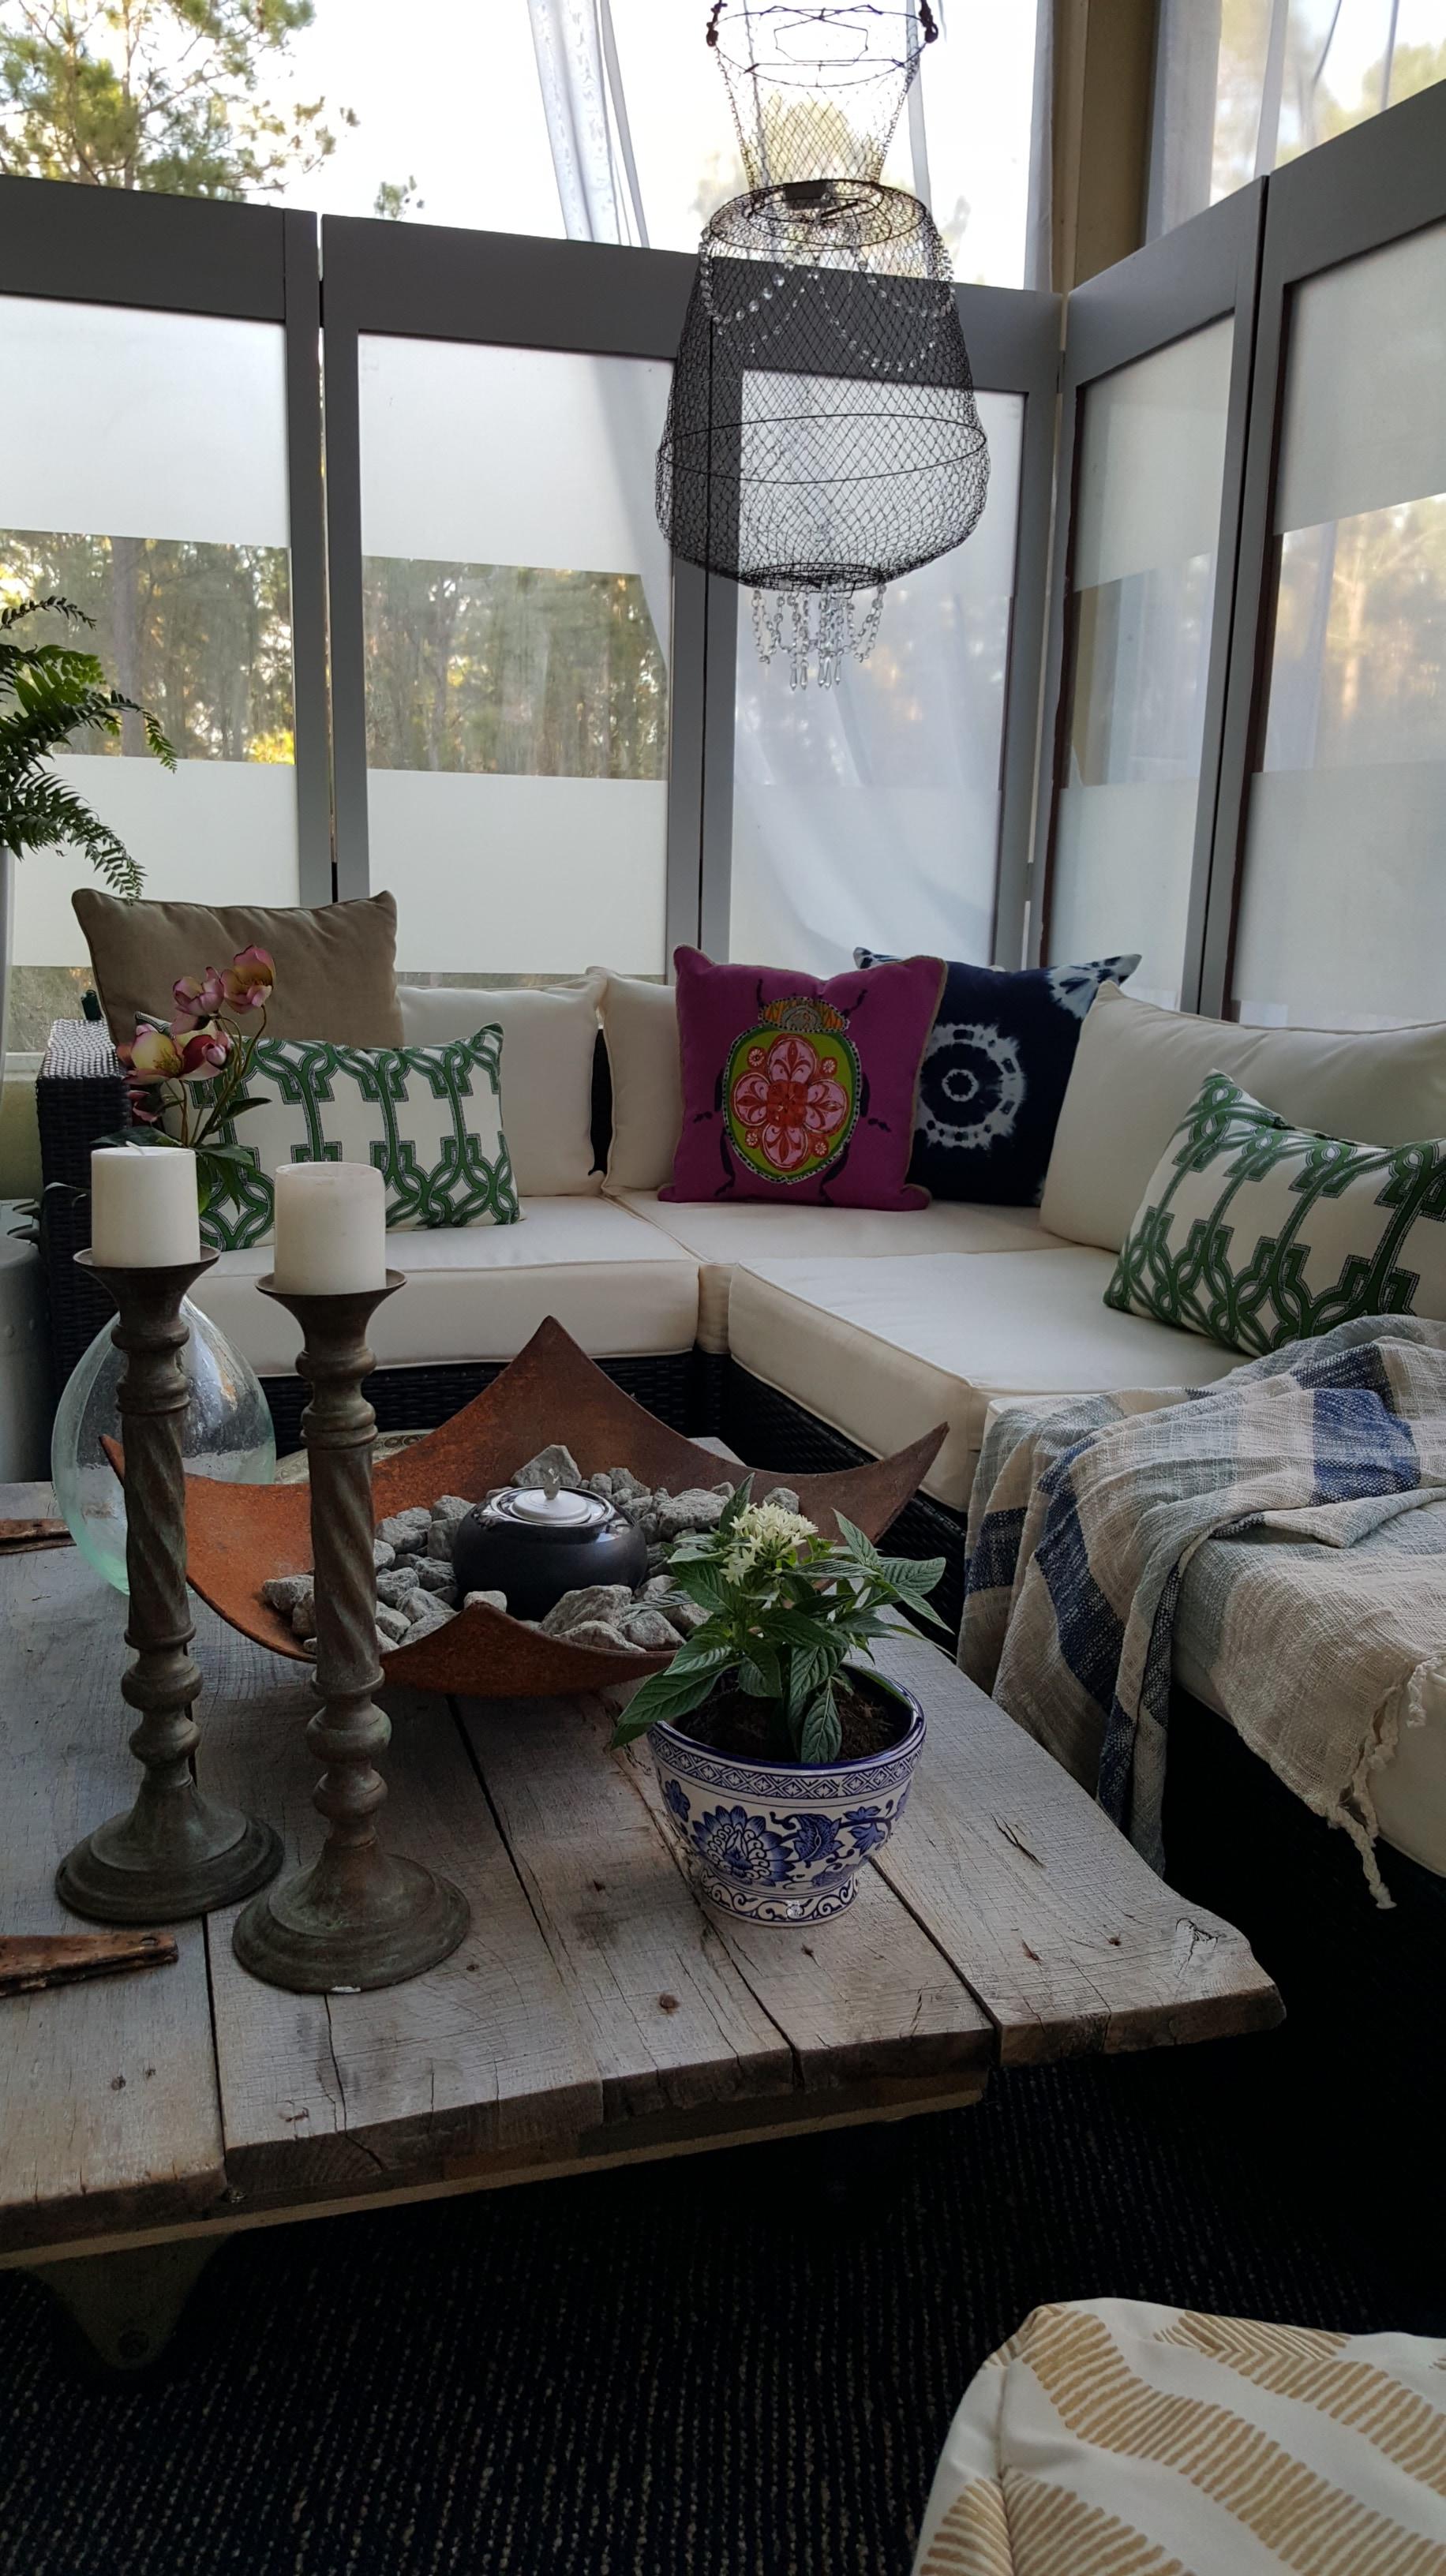 Barn Door Coffee Table DIY - Bees 'N Burlap